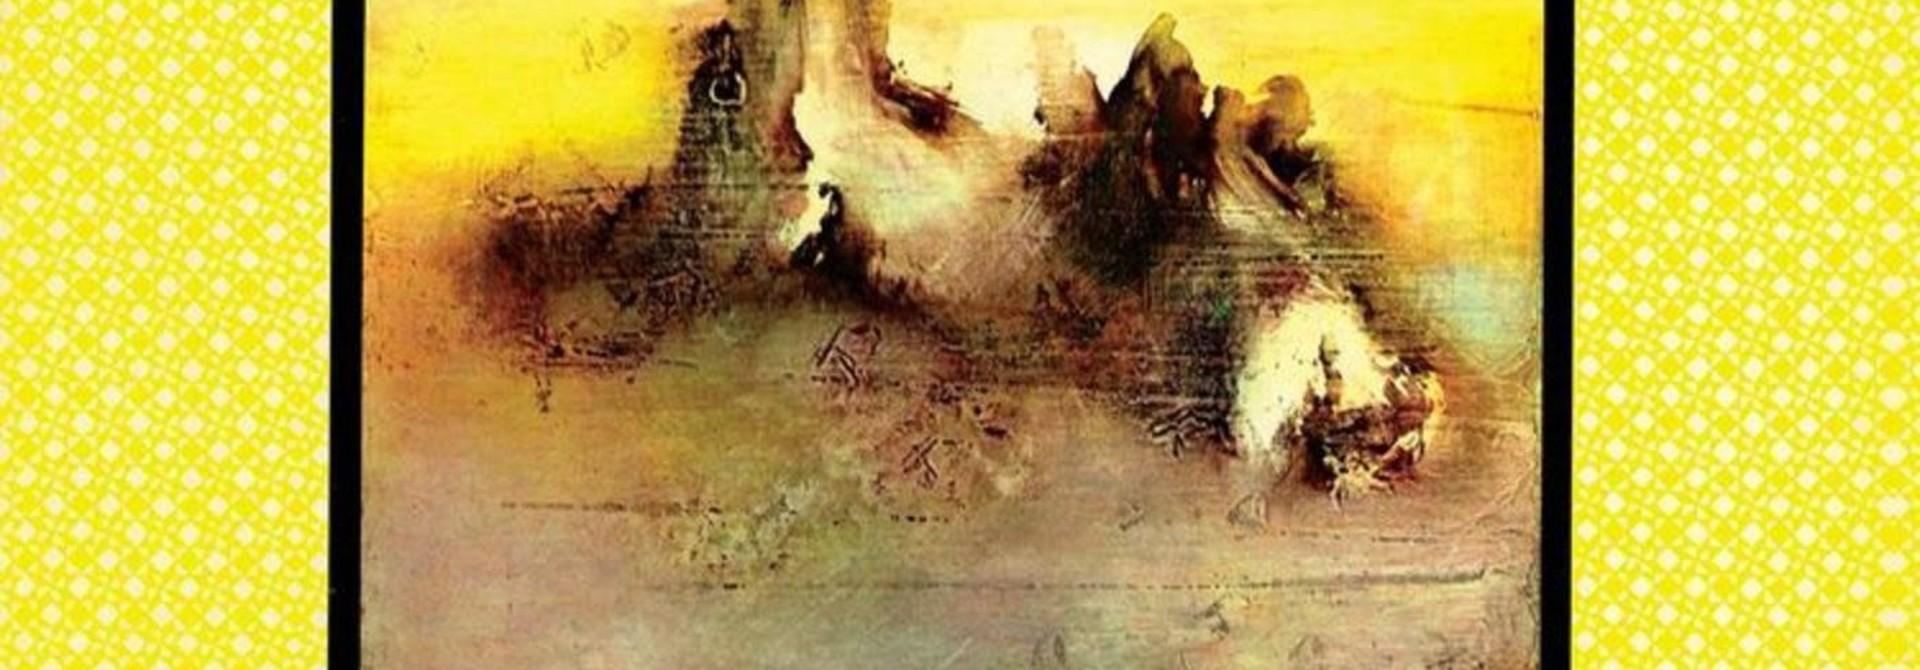 John Coltrane & Don Cherry • The Avant-Garde